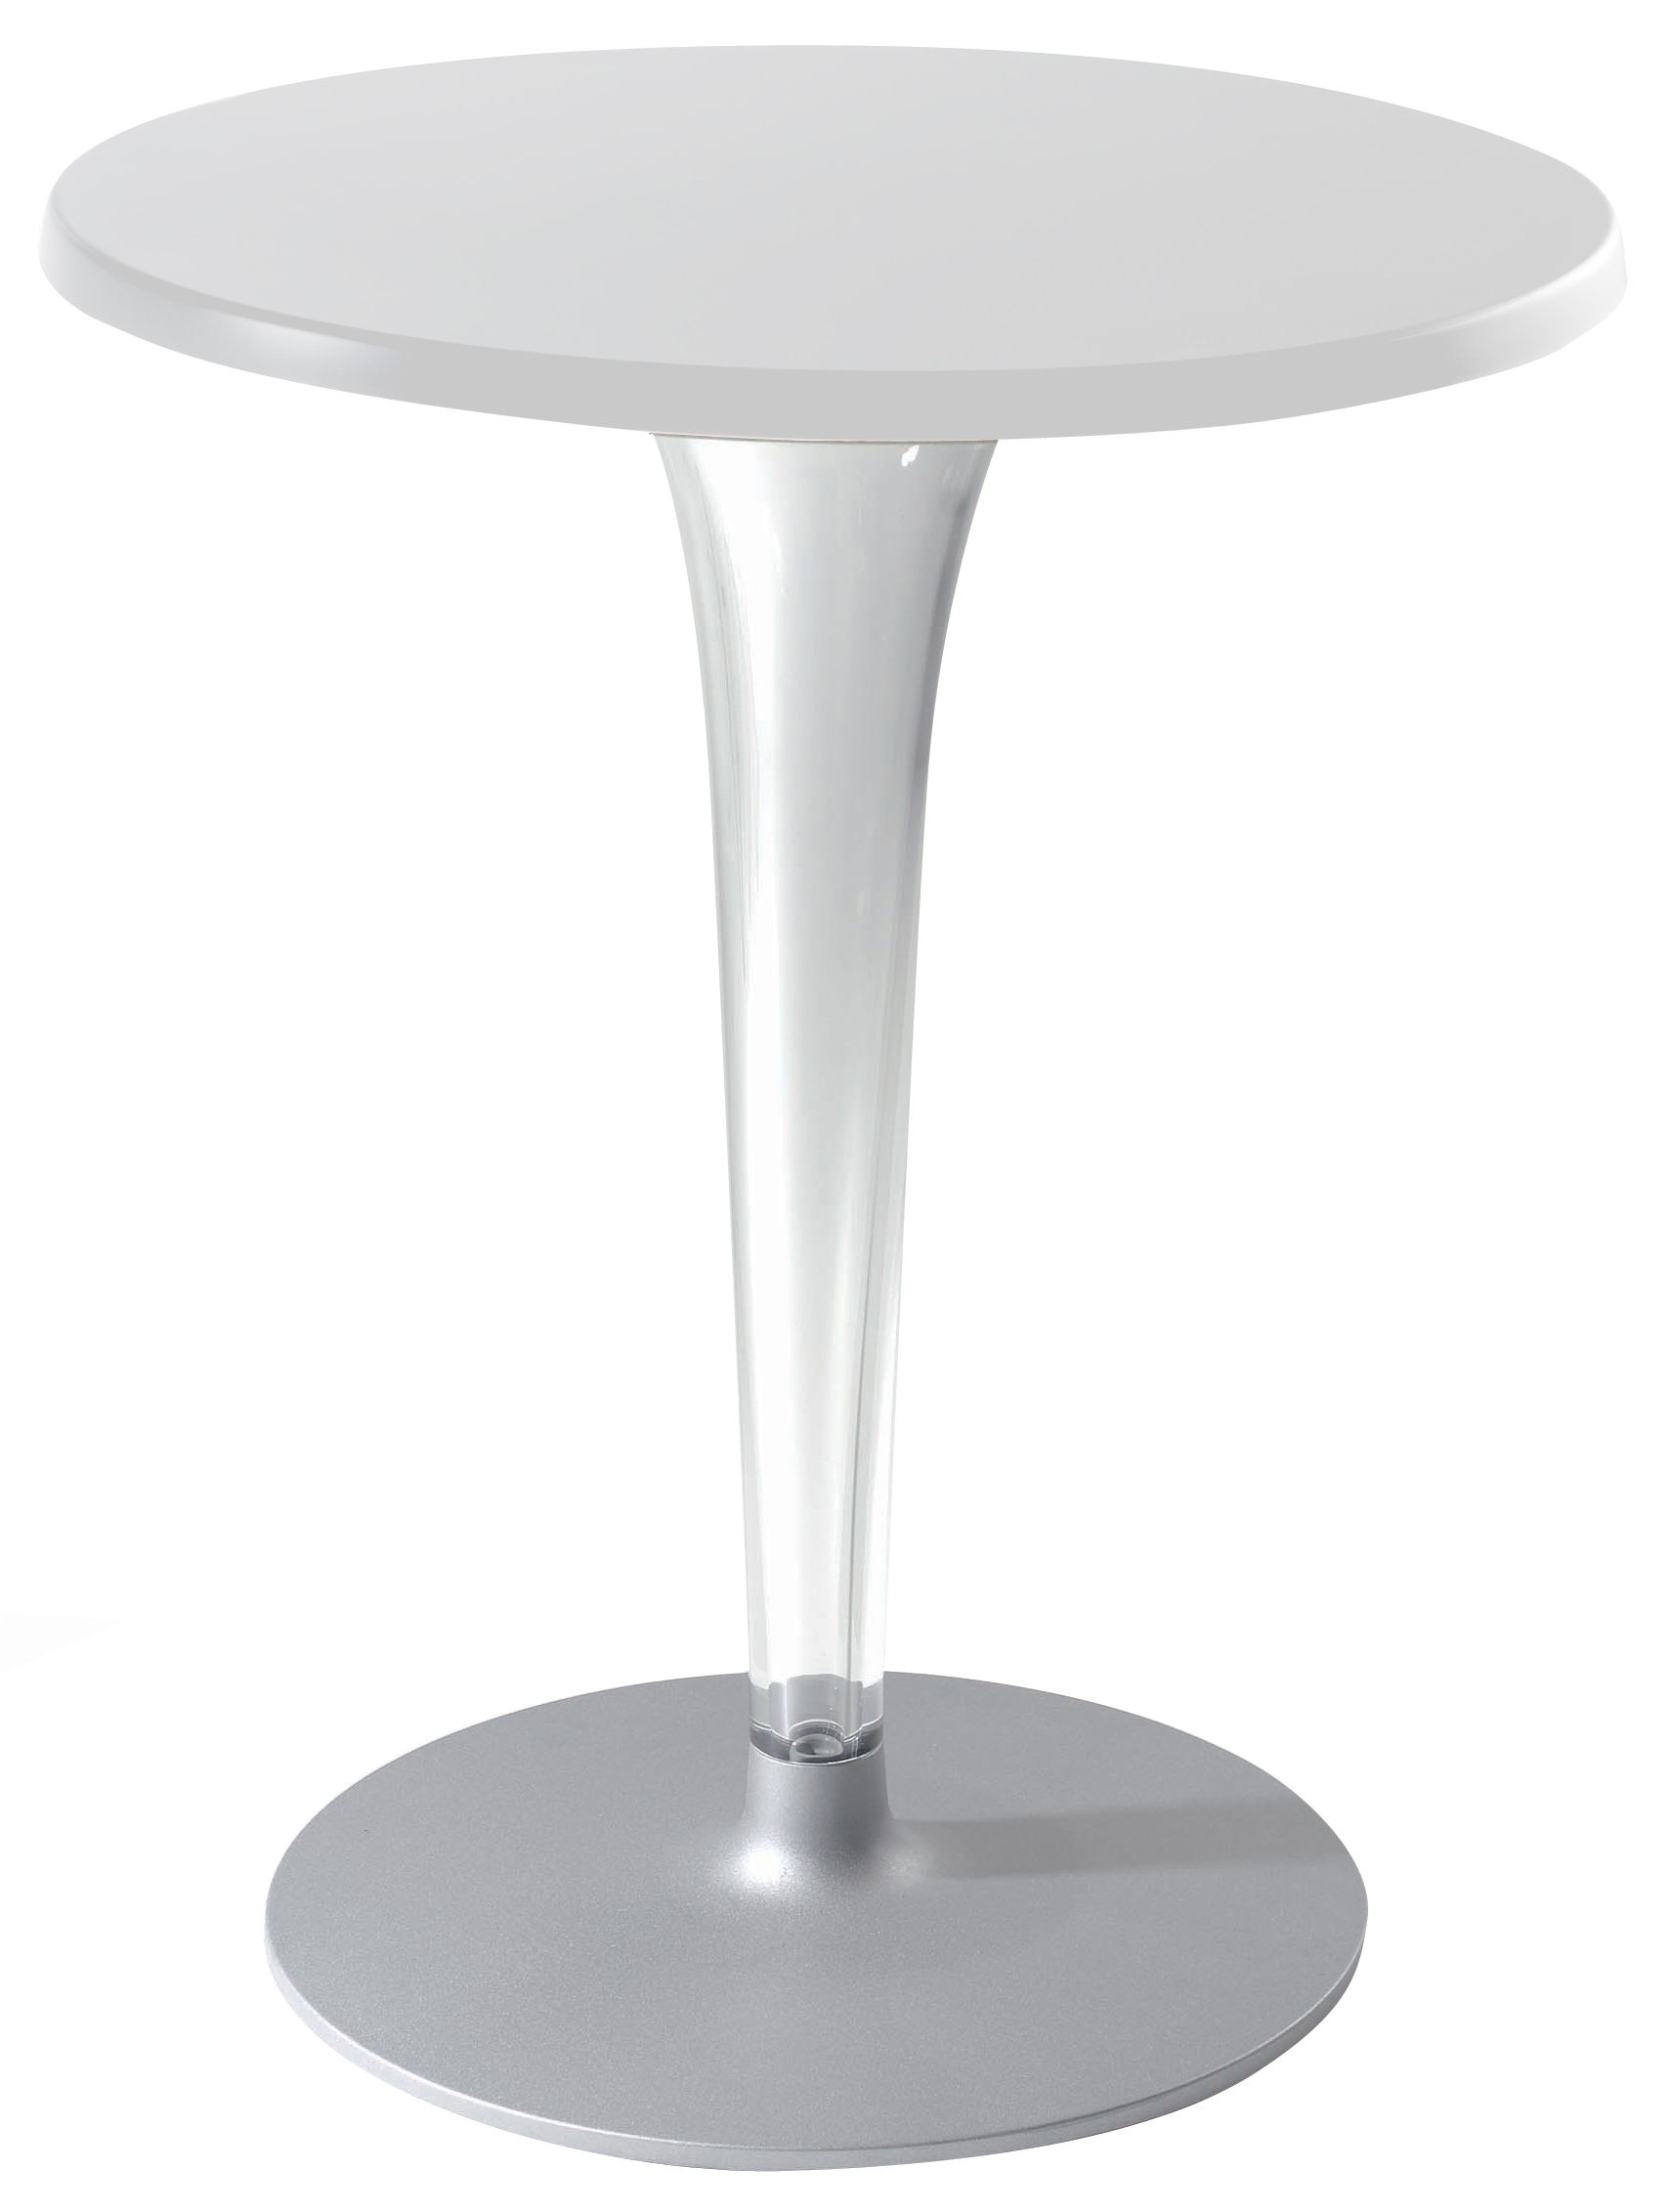 Jardin - Tables de jardin - Table de jardin Top Top - Contract outdoor / Ø 70 cm - Kartell - Blanc/ pied rond - Aluminium verni, Mélamine, PMMA